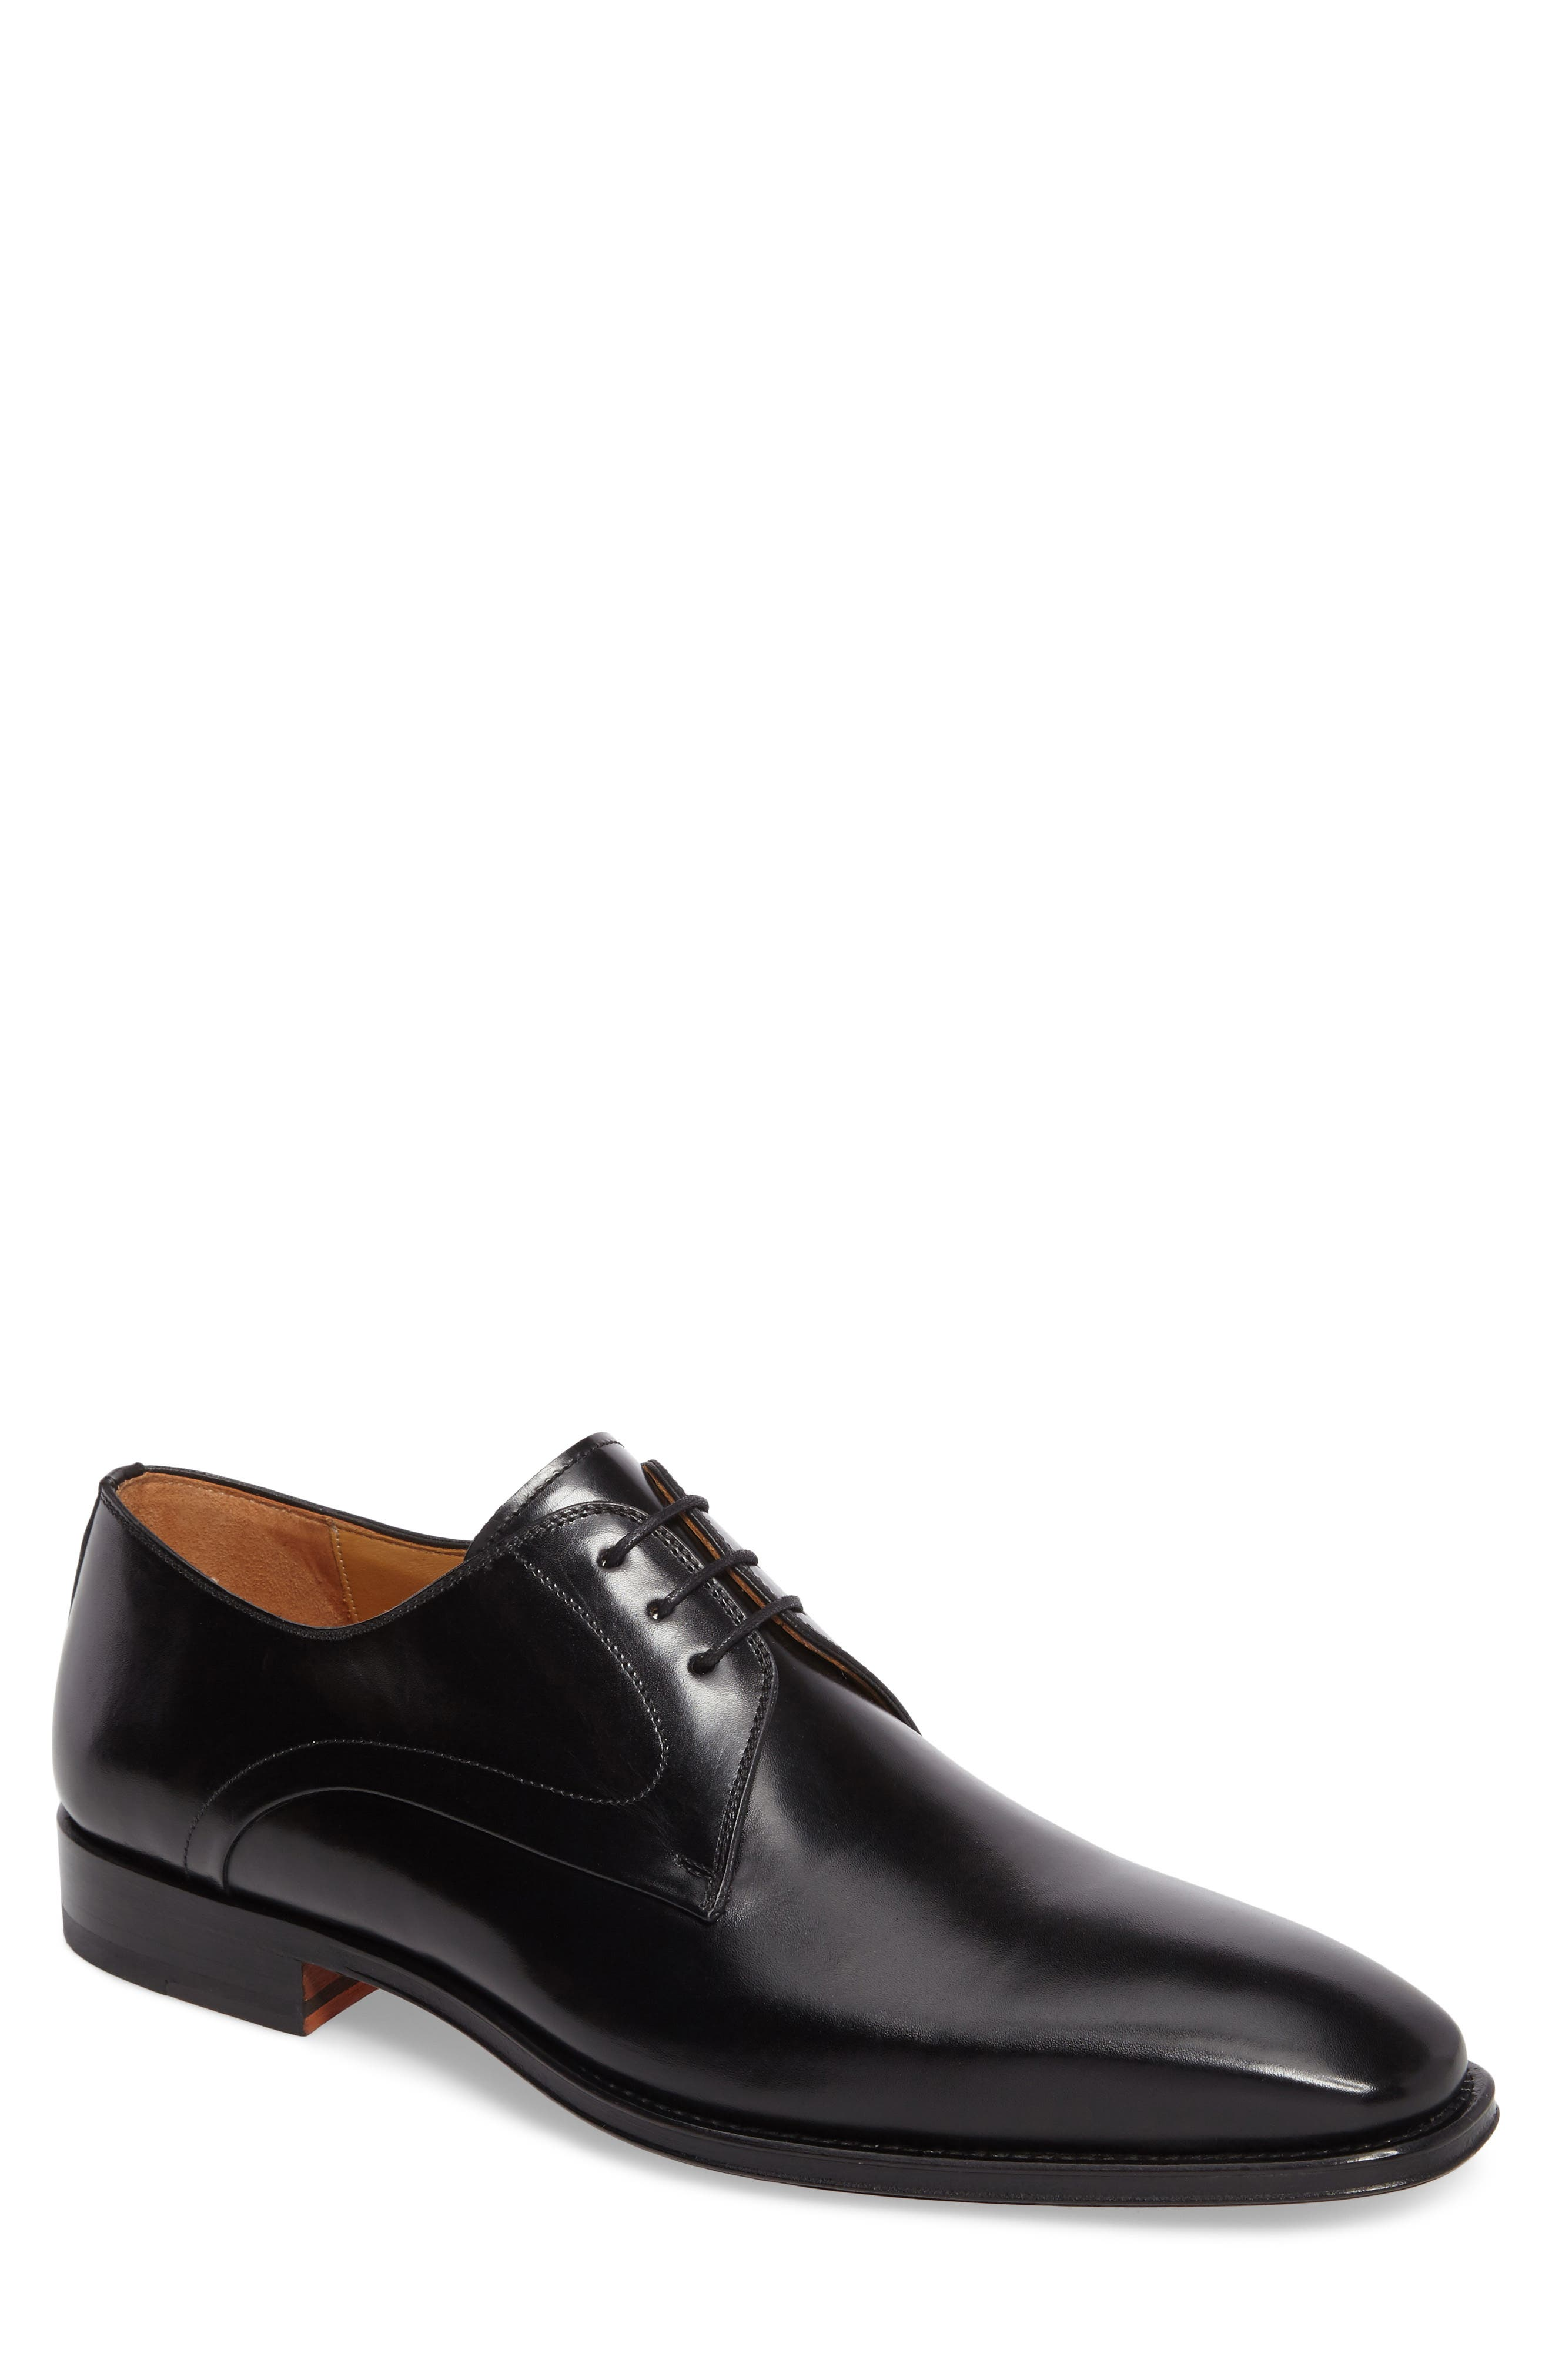 Mario Plain Toe Derby,                             Main thumbnail 1, color,                             Black Leather